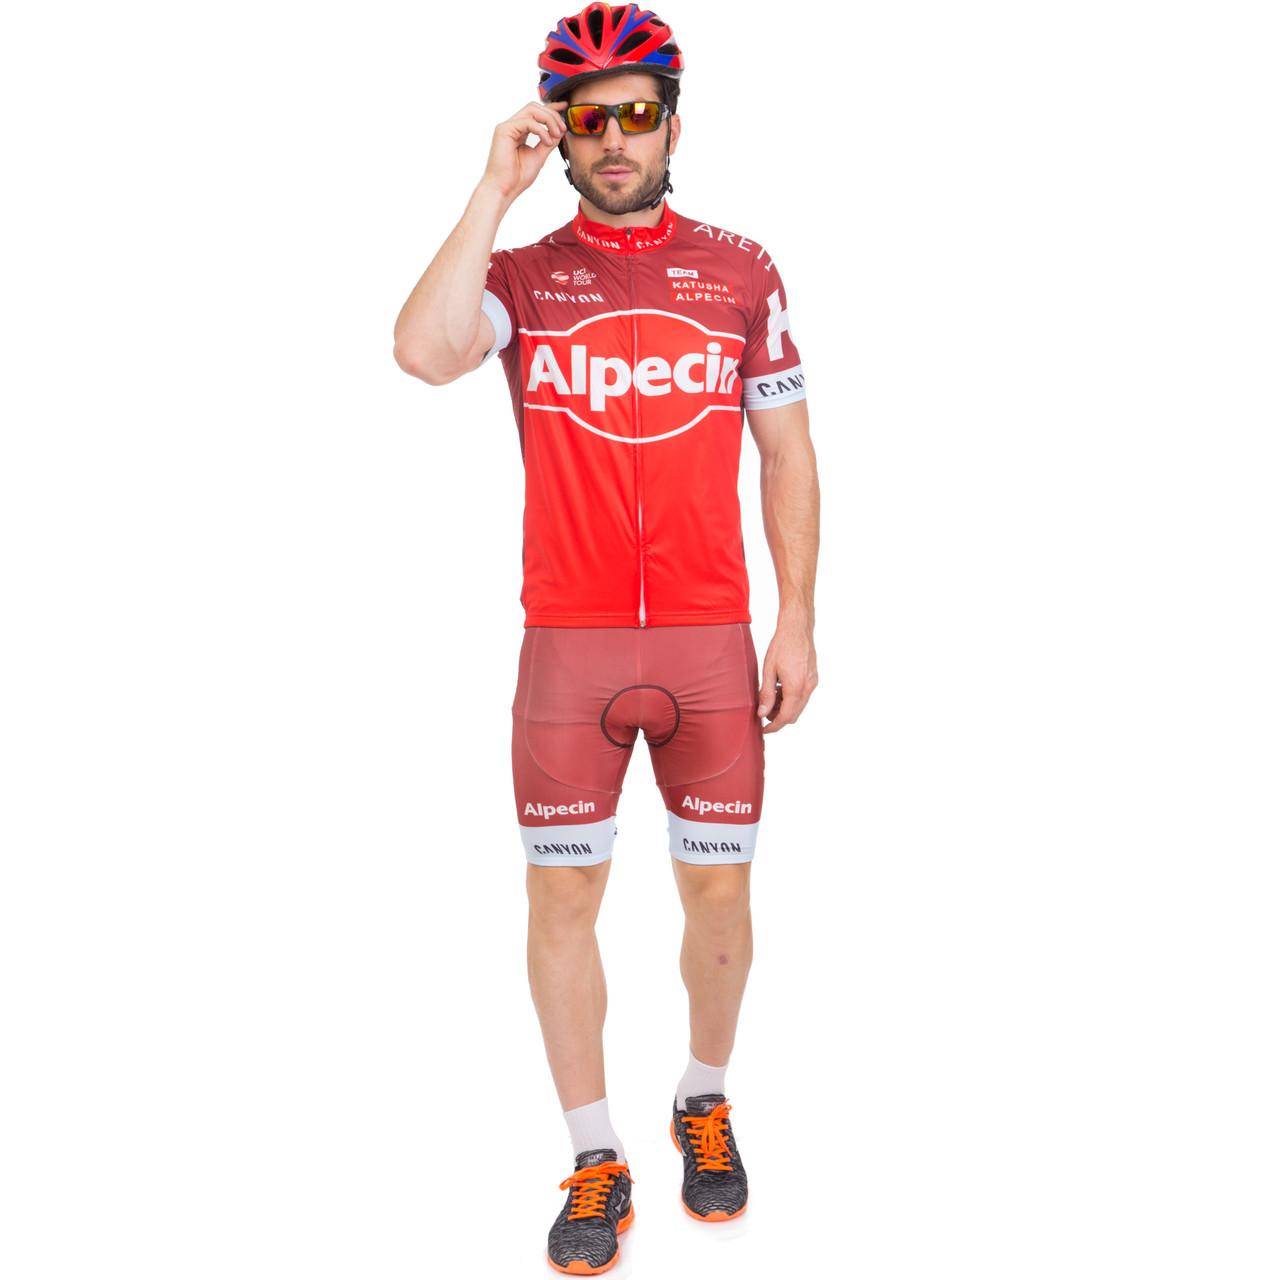 Велоформа короткий рукав ALPECIN (M-3XL-55-90кг-168-192см, красный) M-55-65кг-168-175см PZ-Y-20_1